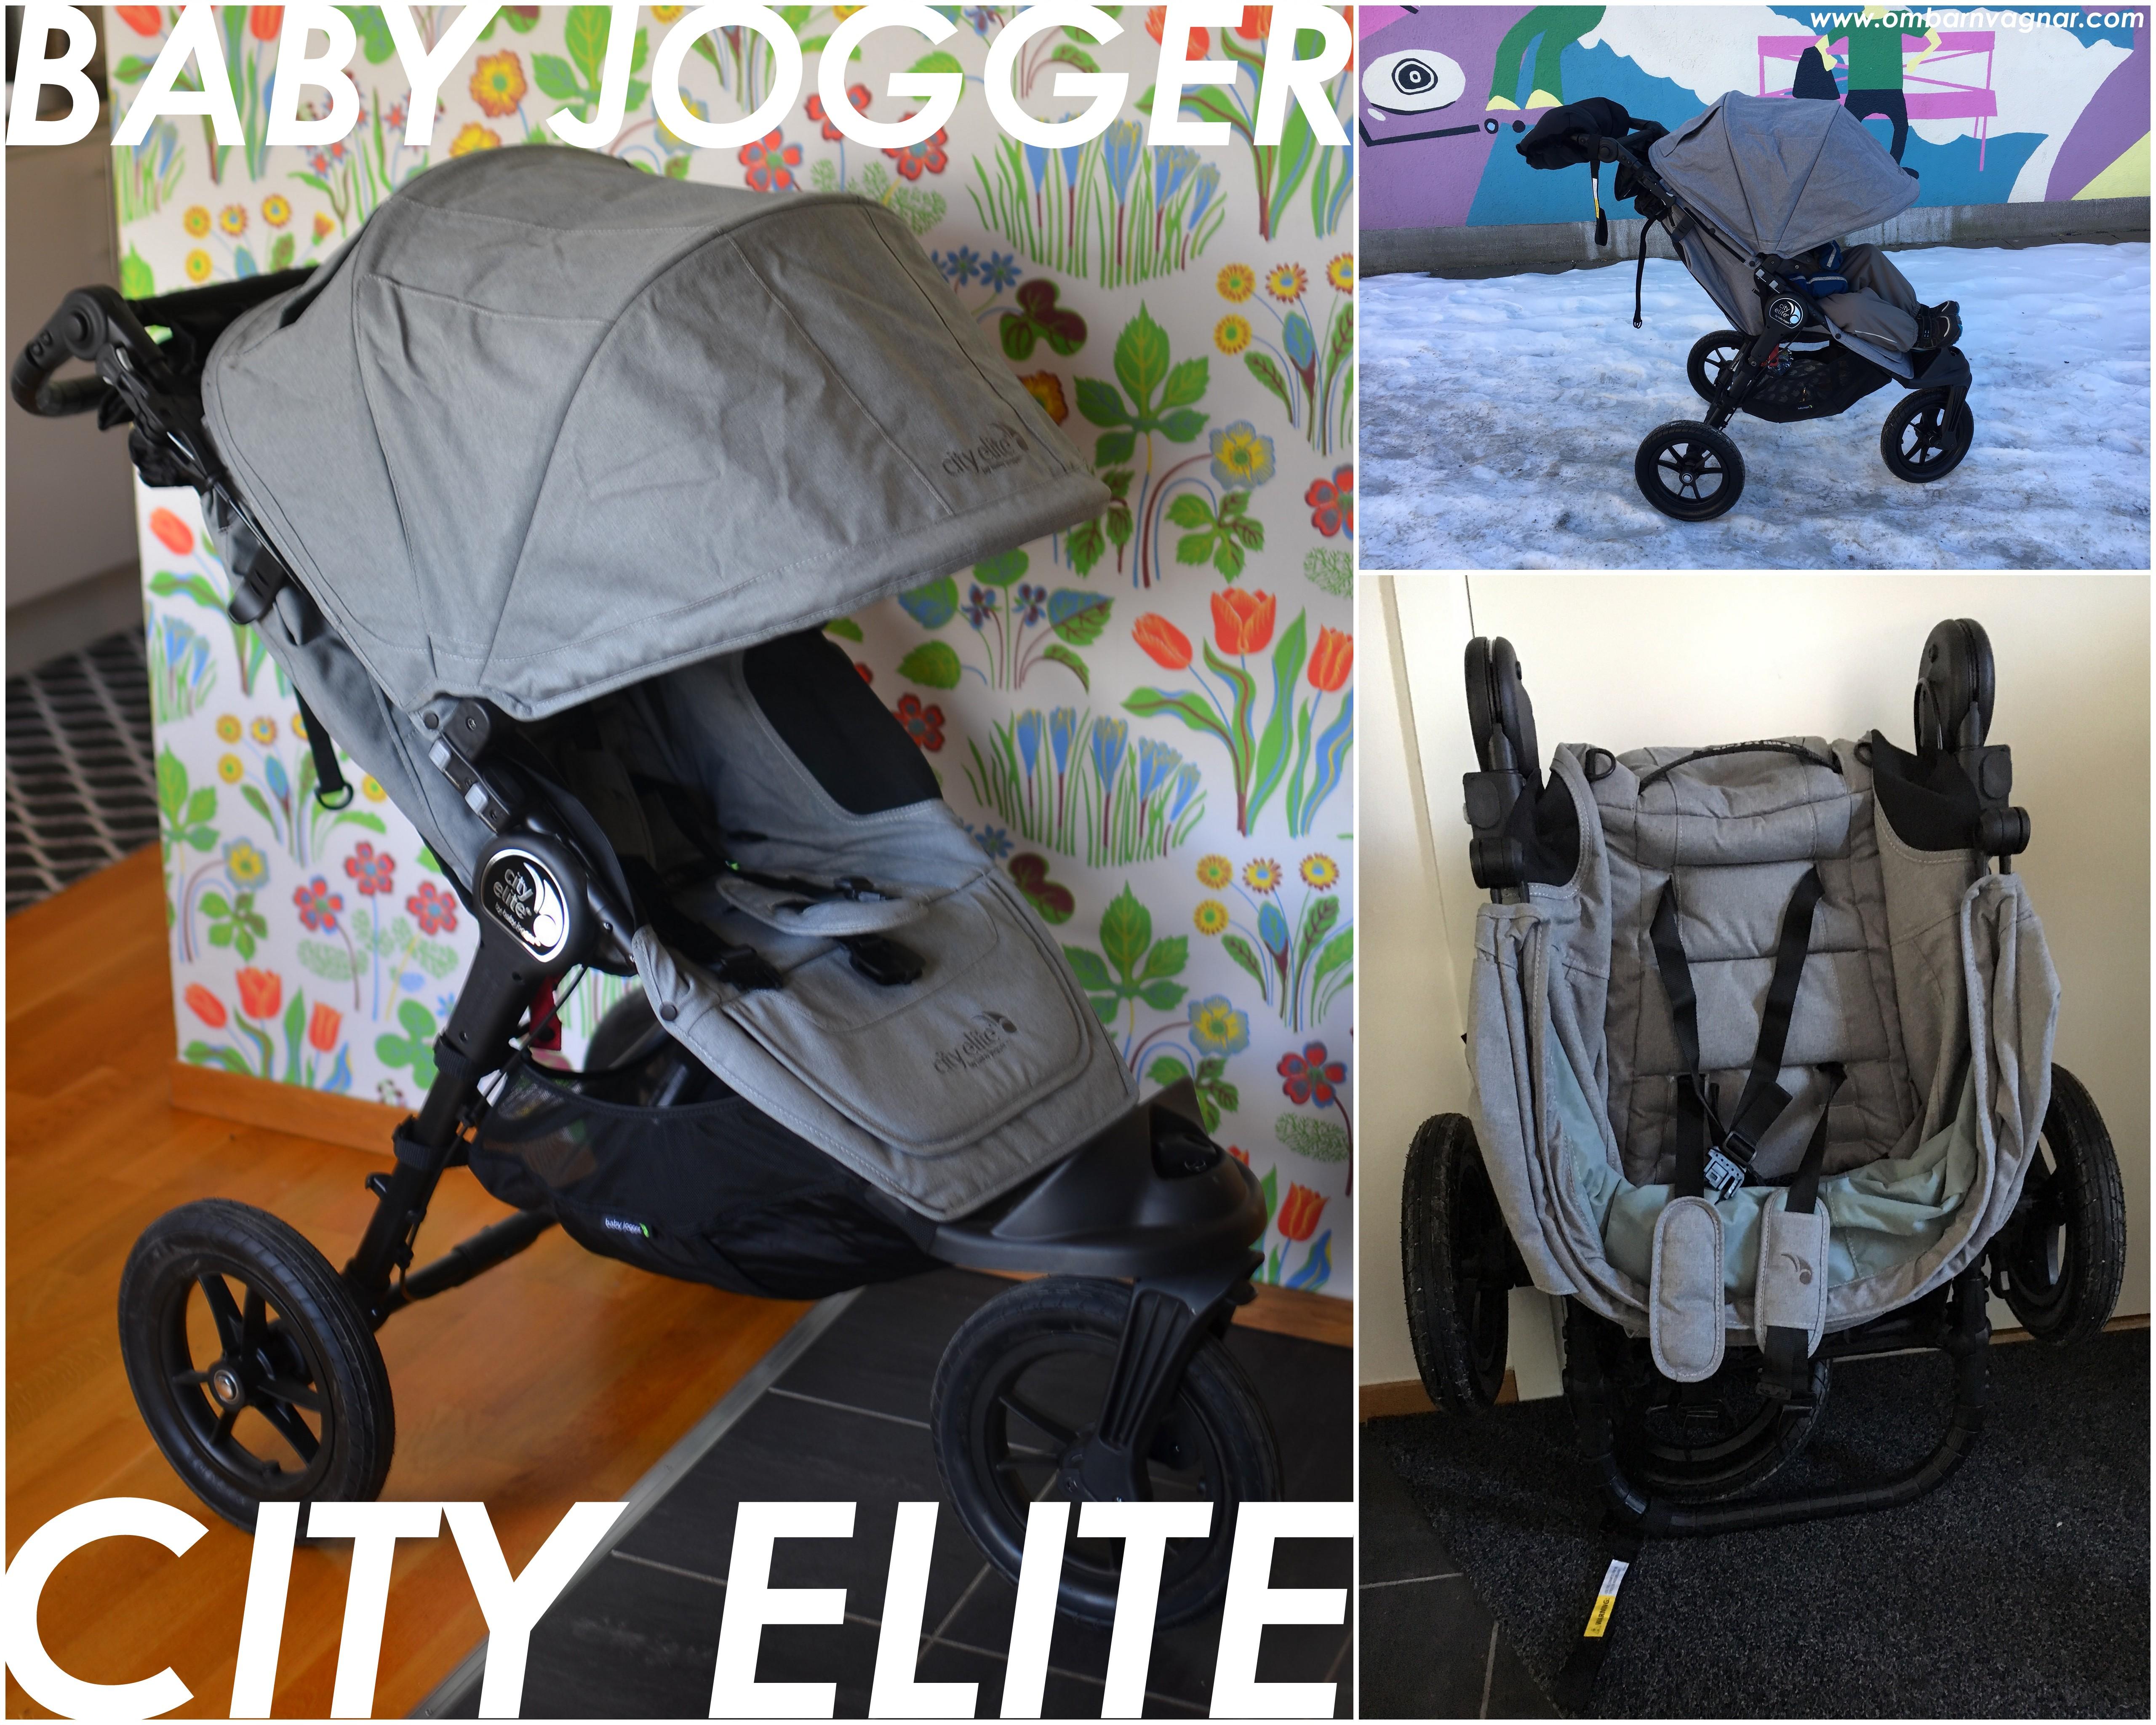 Baby Jogger City Elite barnvagn med tre hjul